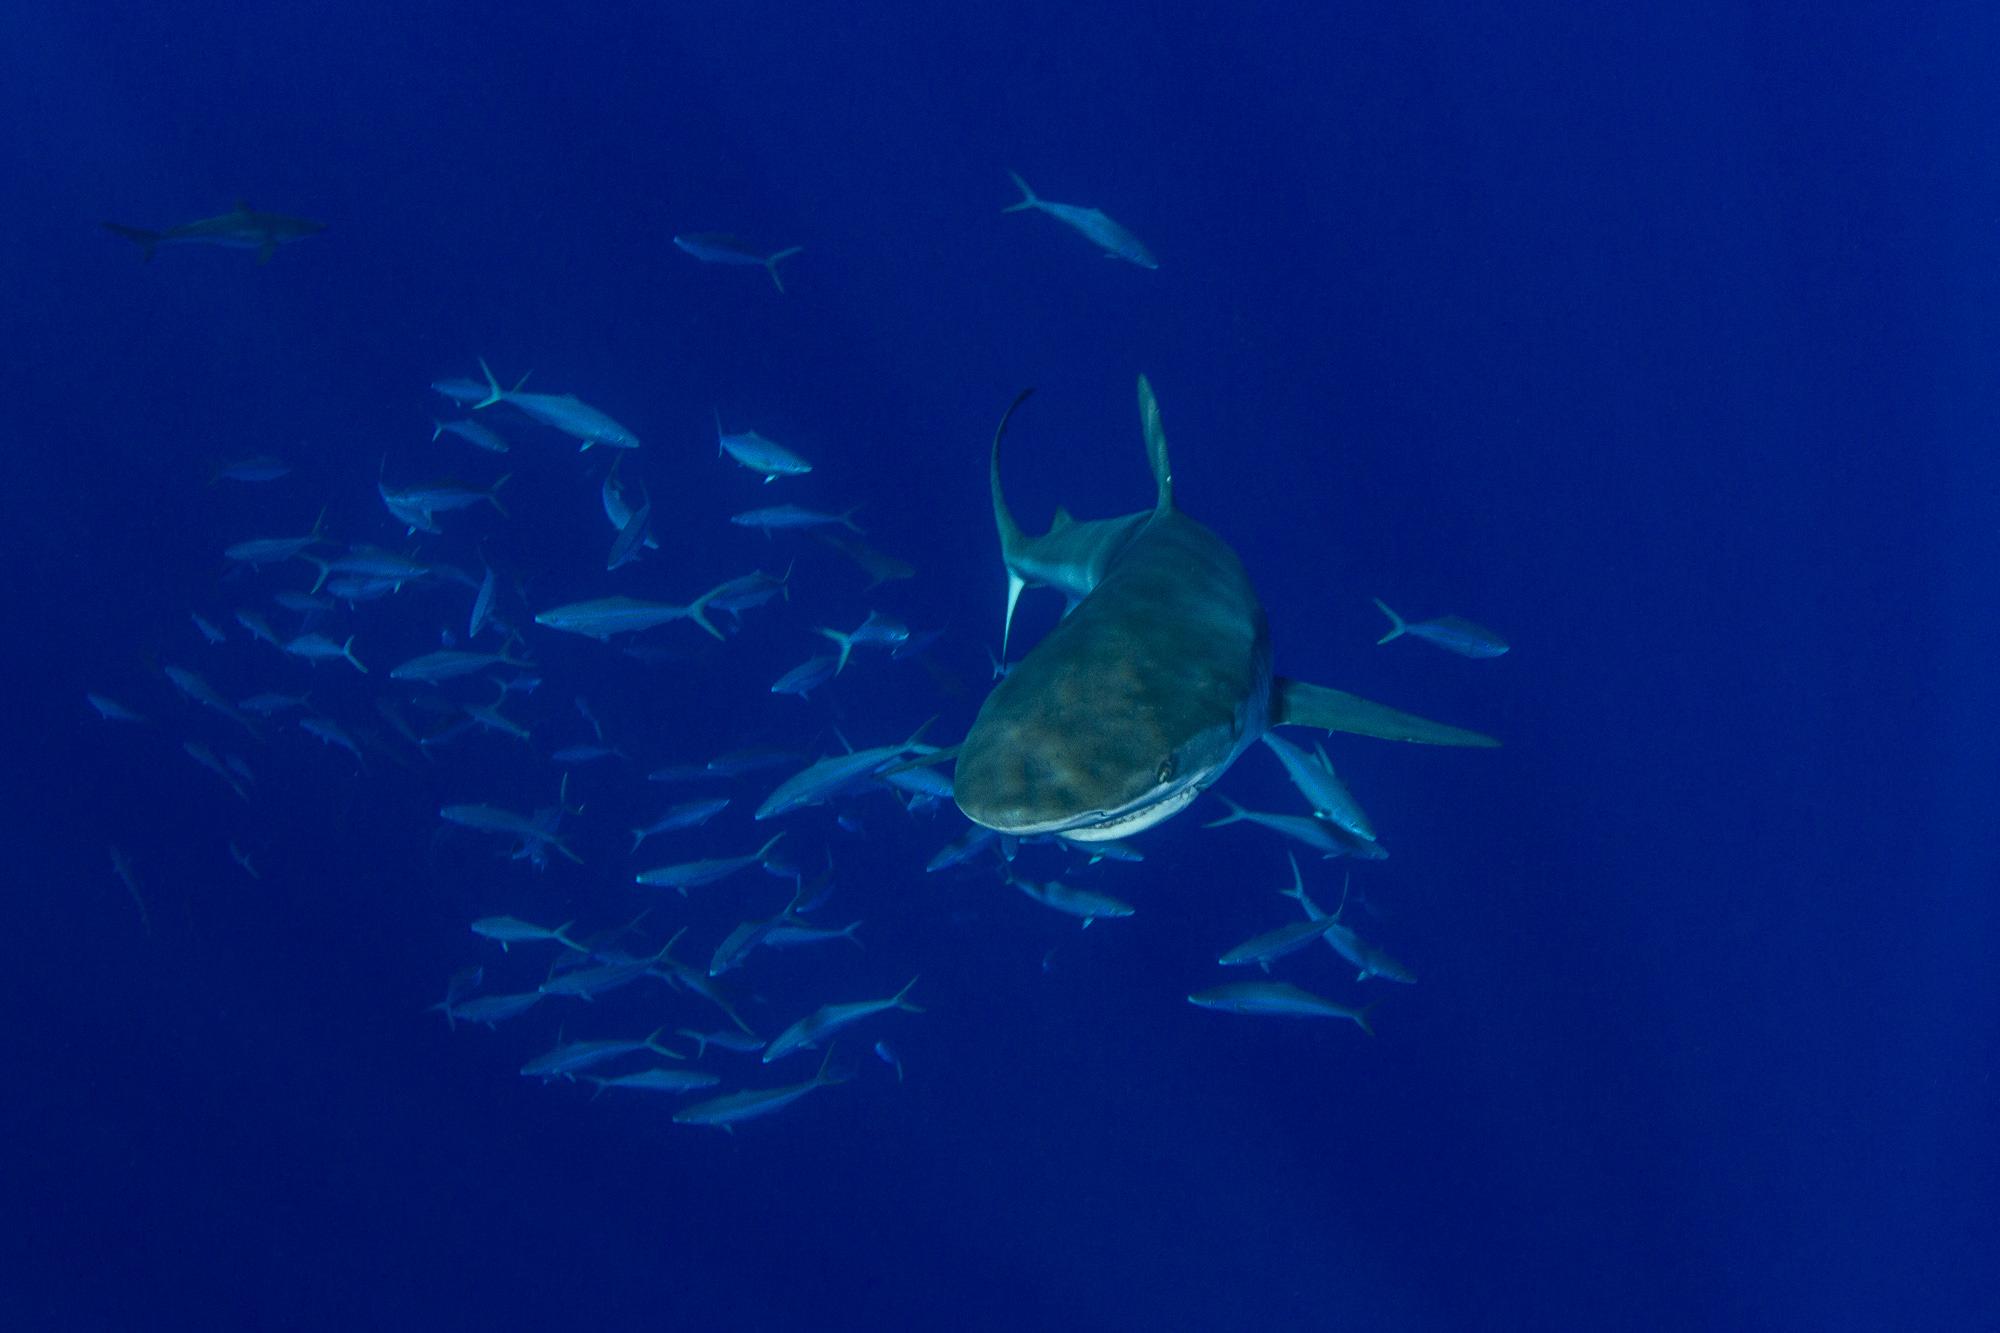 A large, 3 meter (10ft) dusky shark made an appearance!